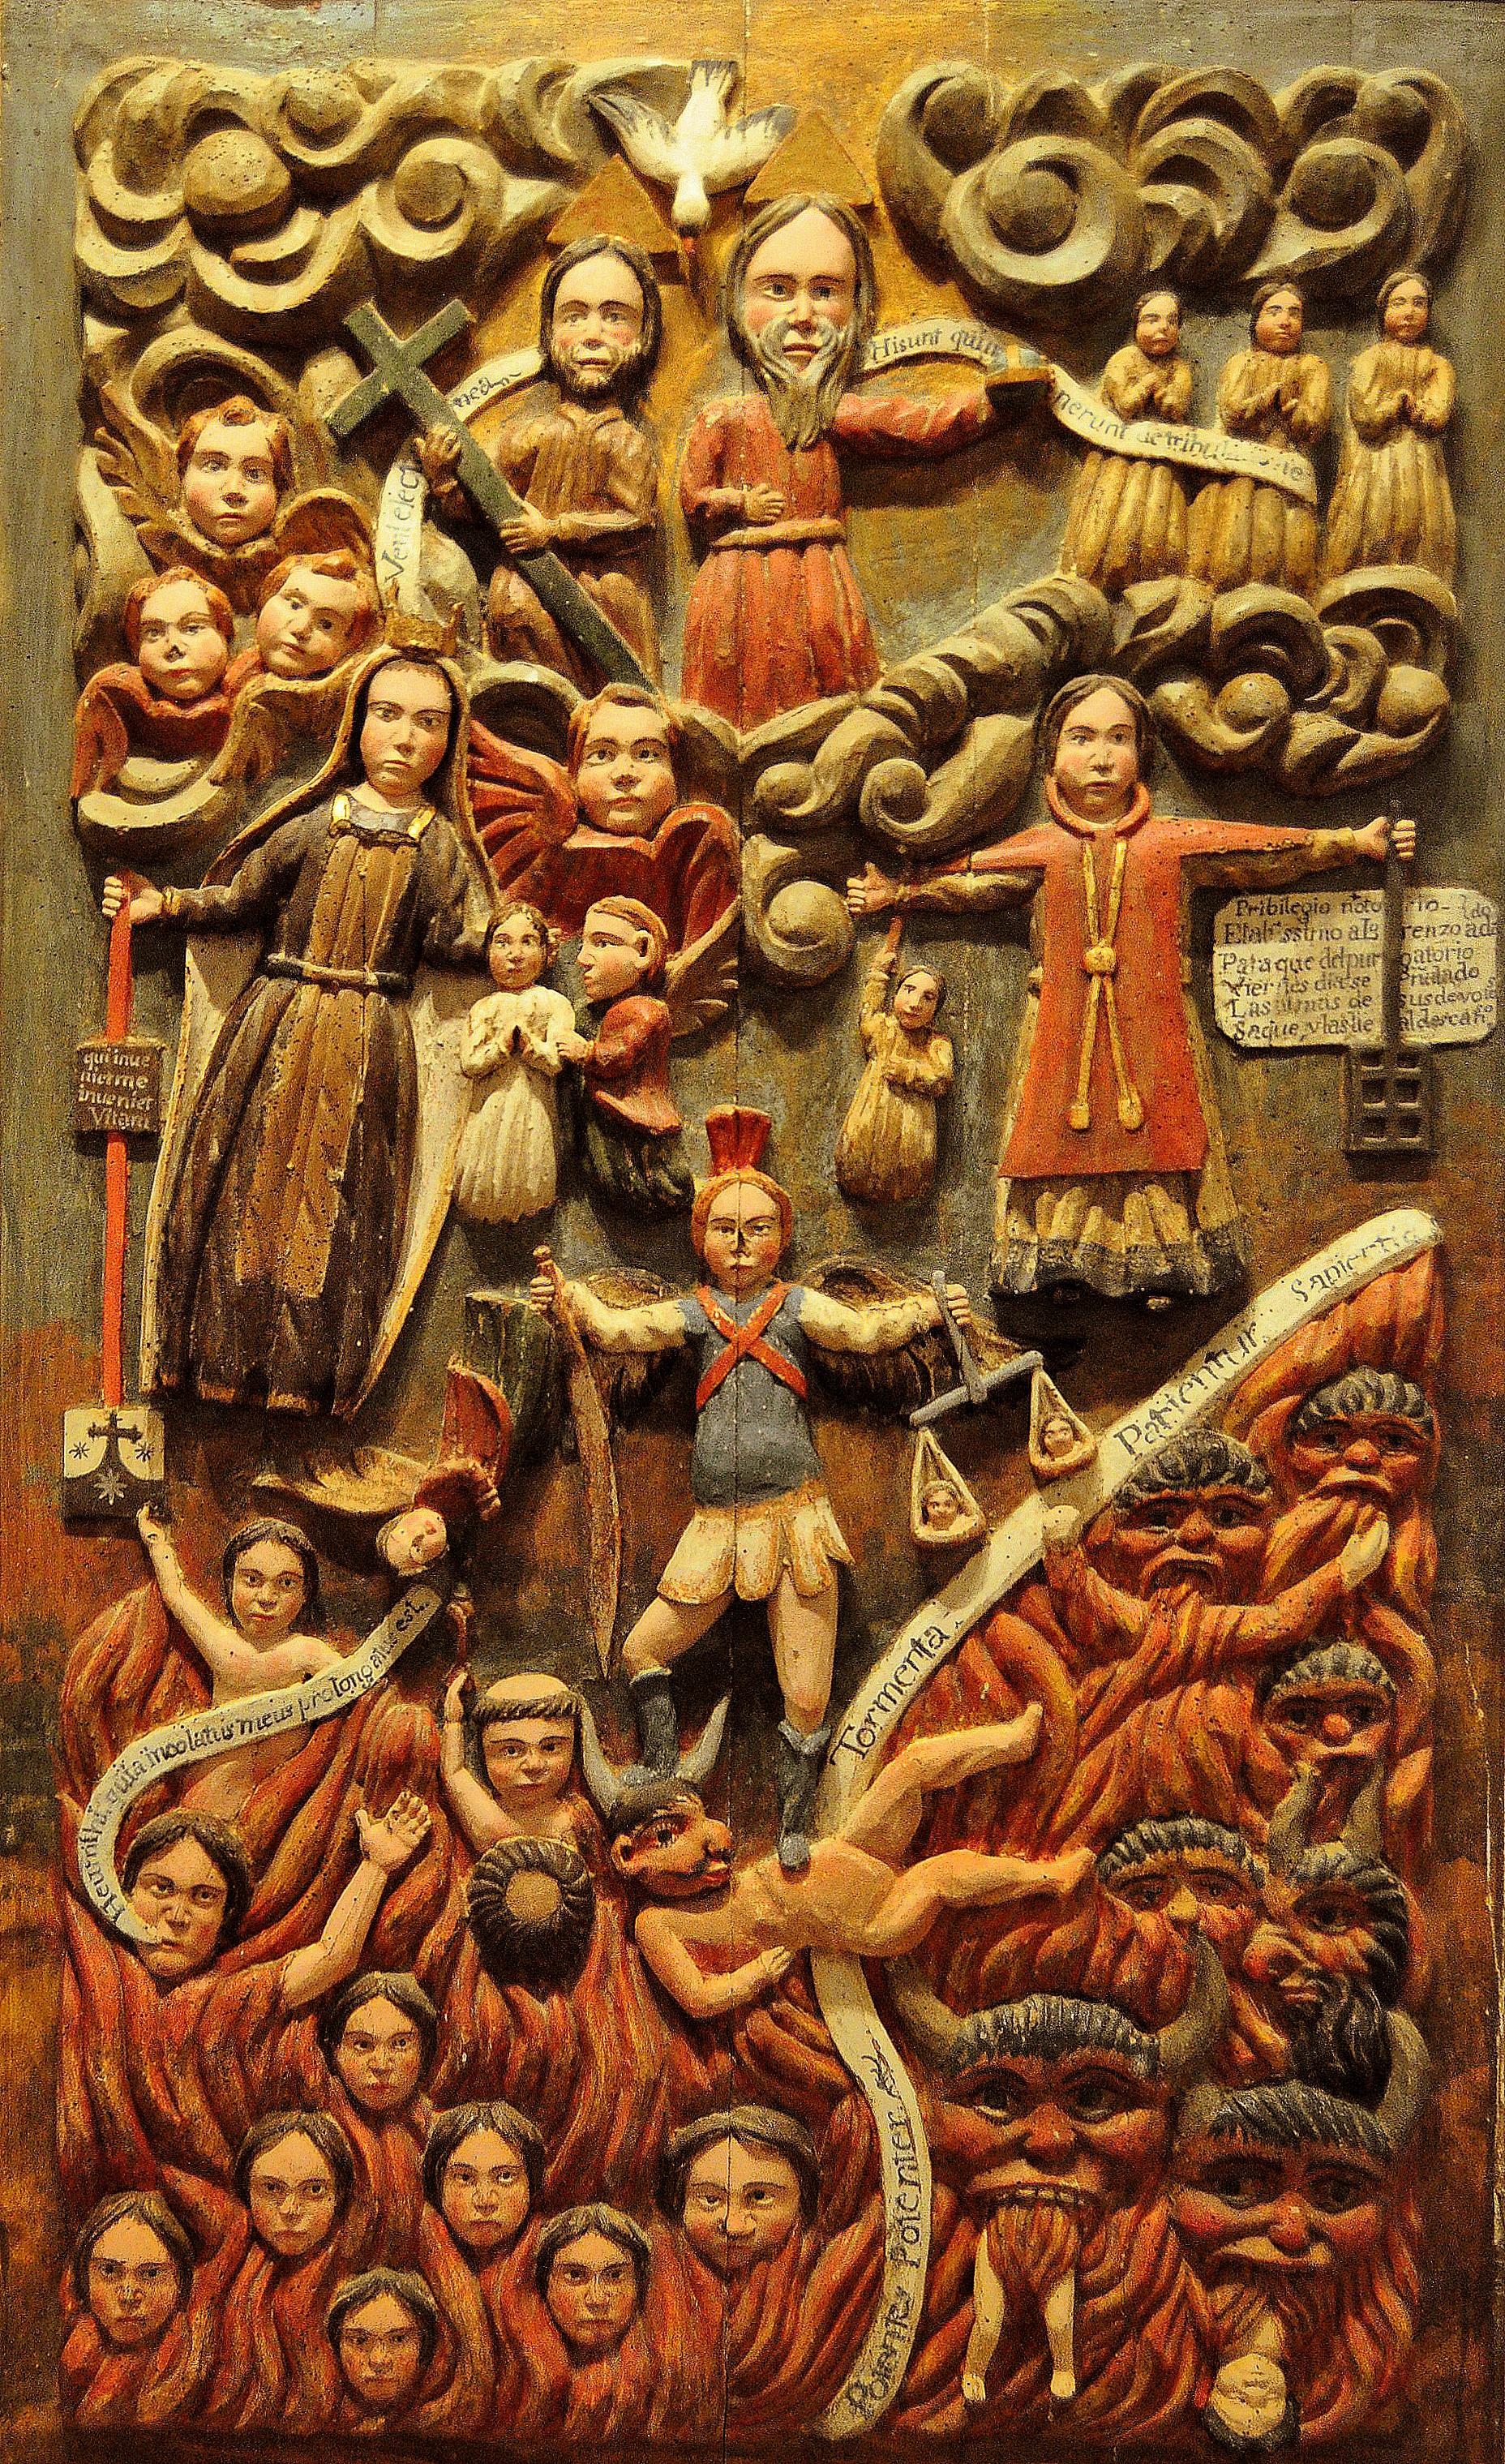 CUADRO DE ÁNIMAS. (S. XVIII). Procede de Valdavida.